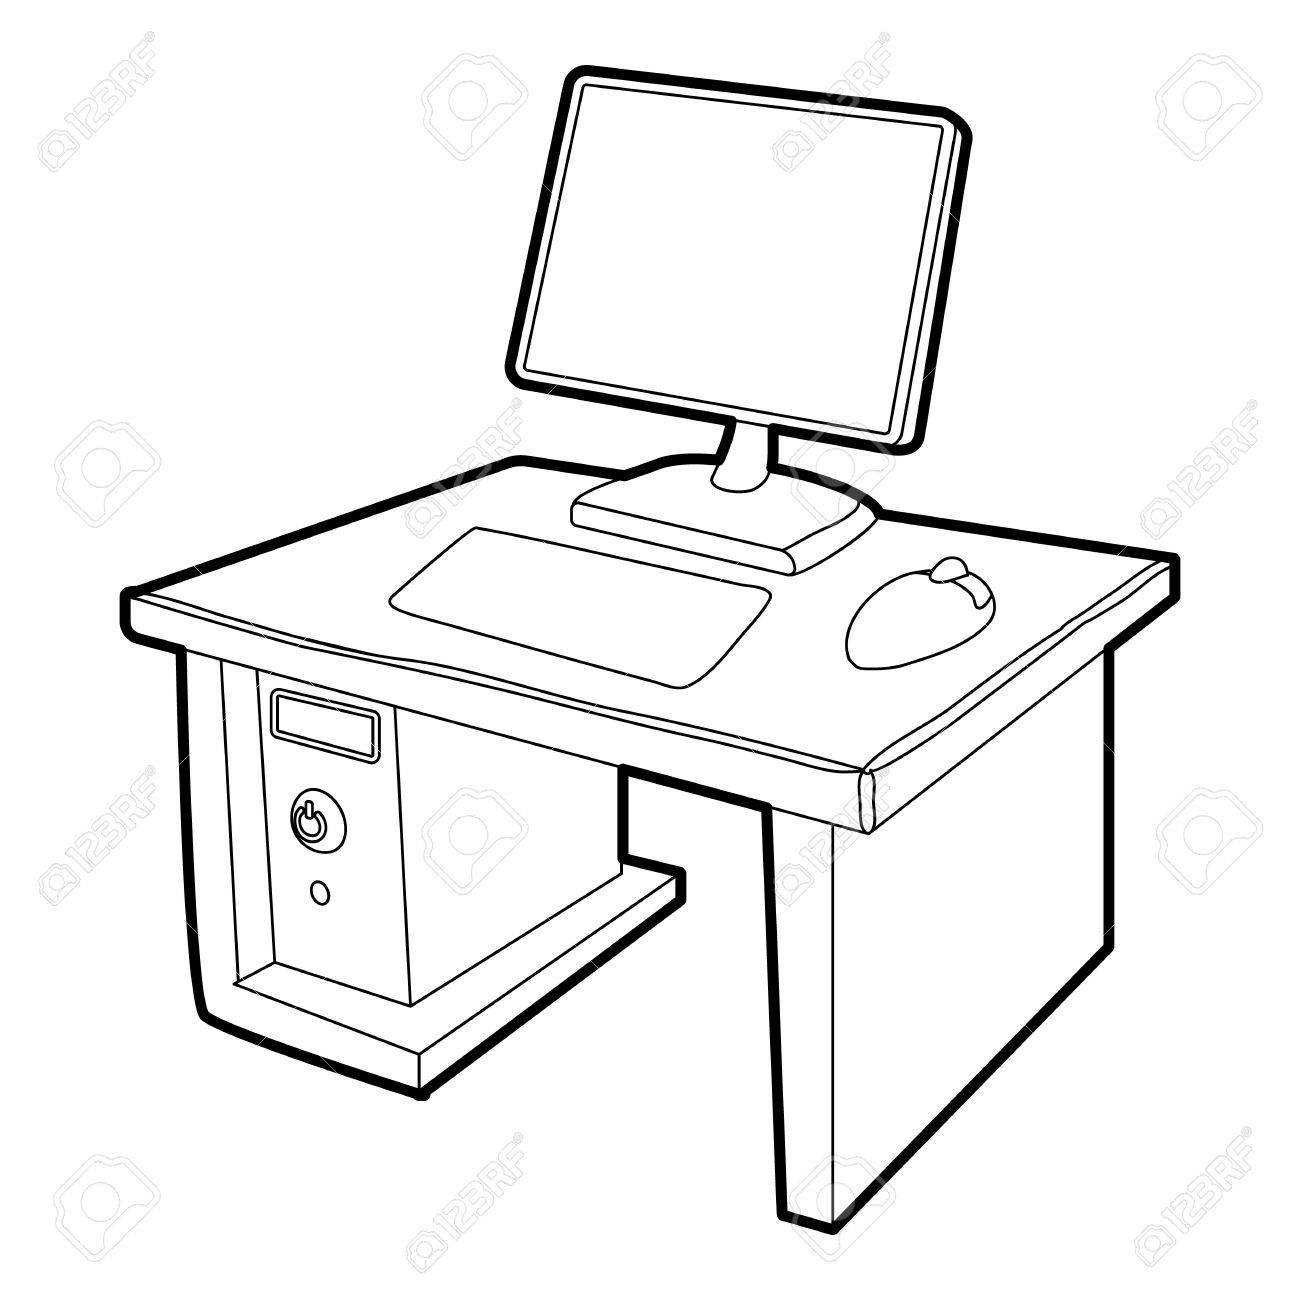 Computer Desk Drawing At Getdrawings